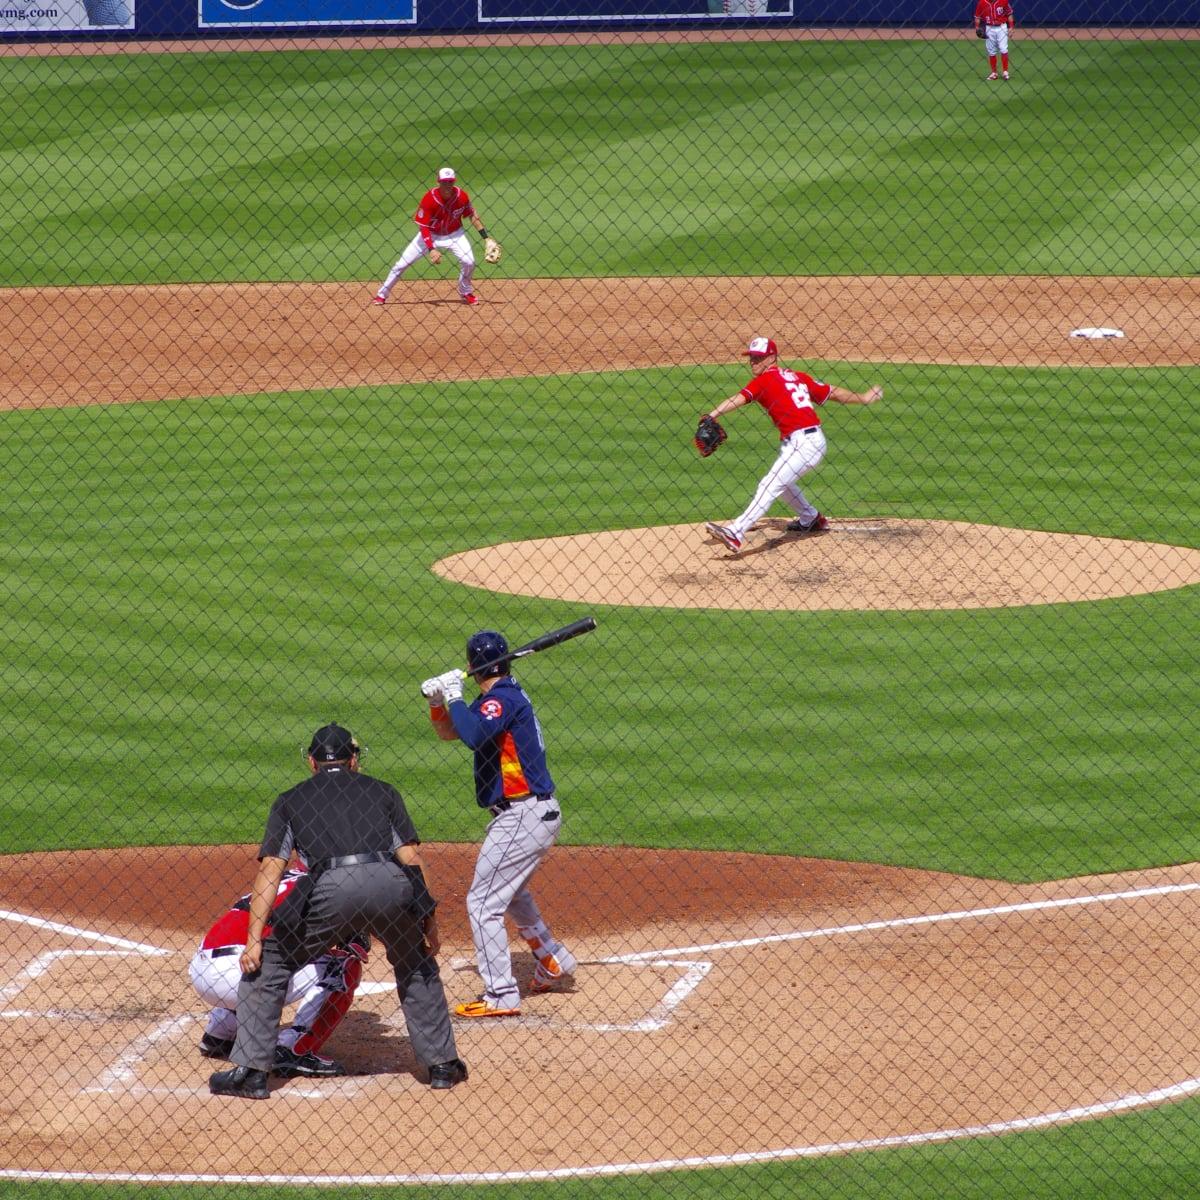 Travel - West Palm Beach - Astros vs Nationals